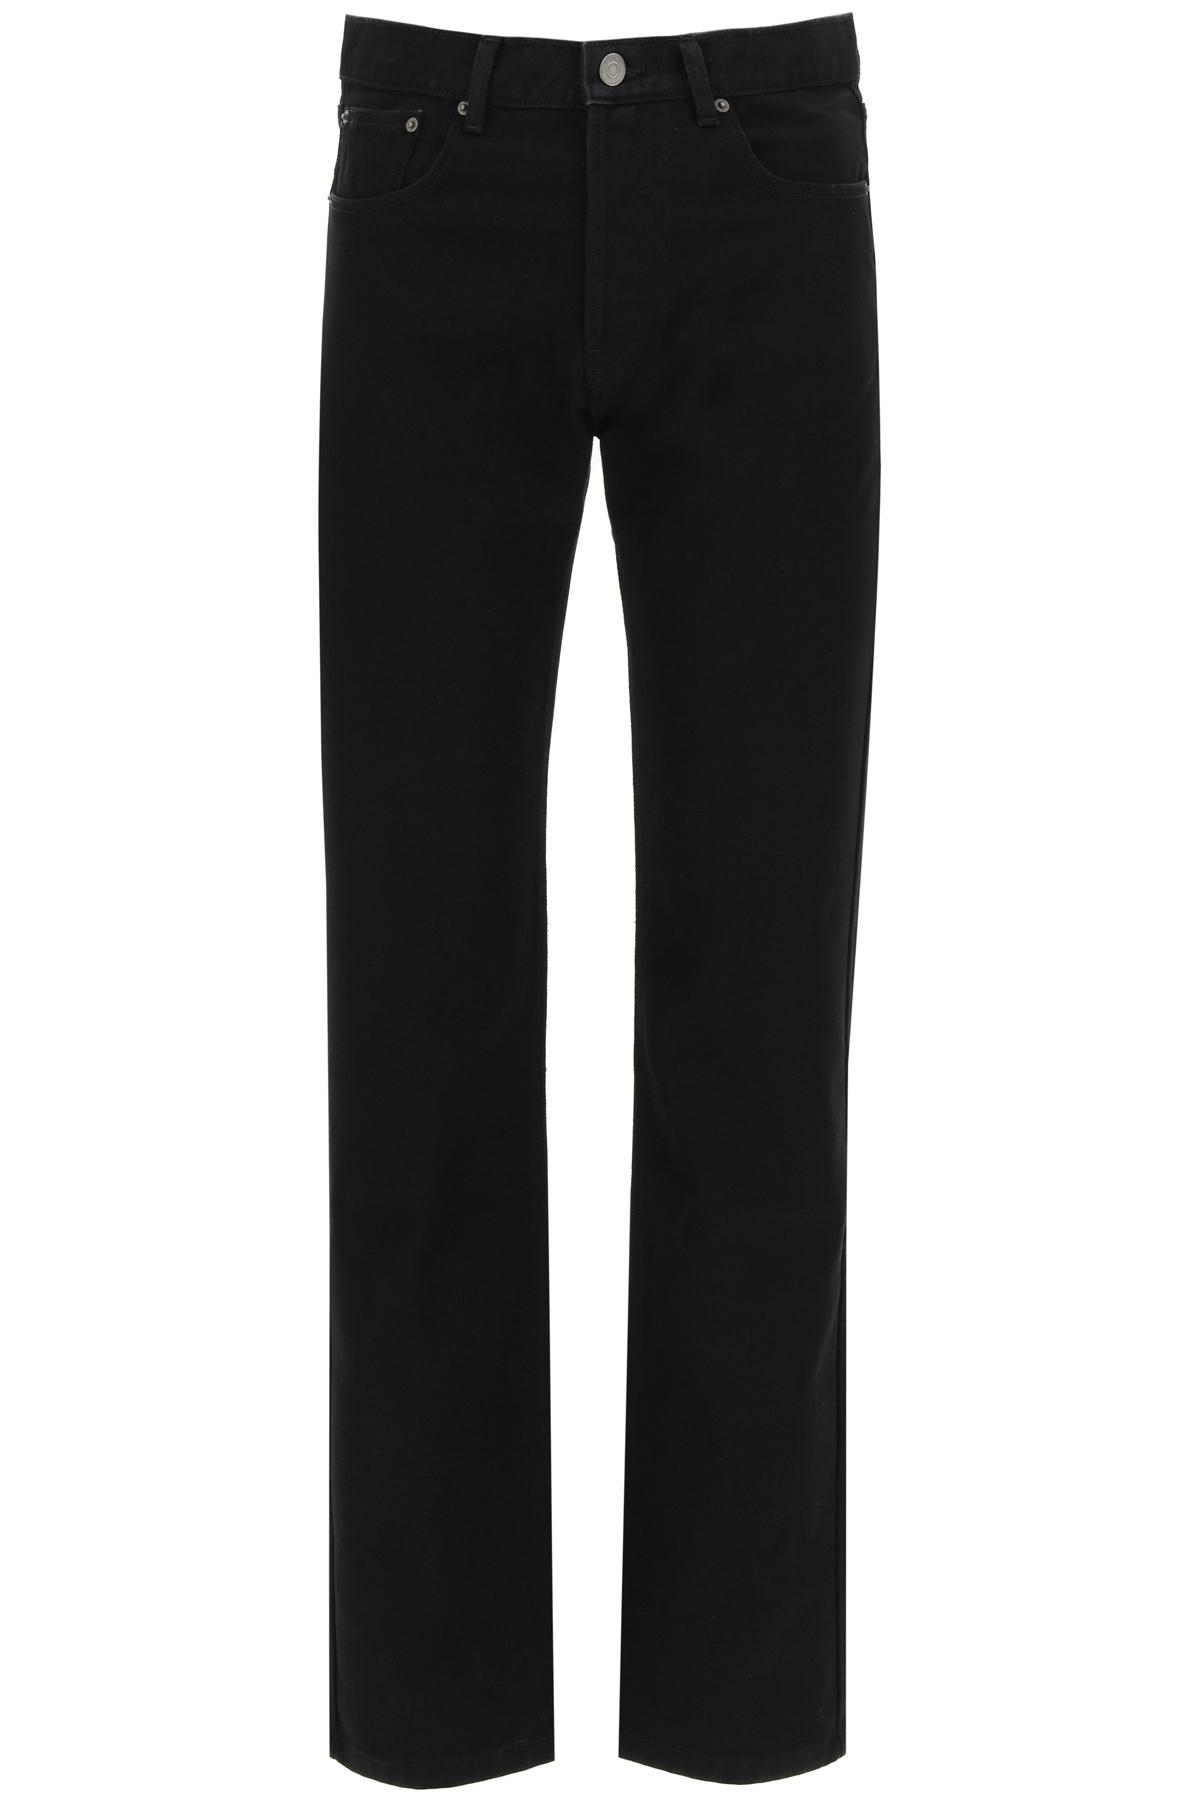 Kenzo jeans regular